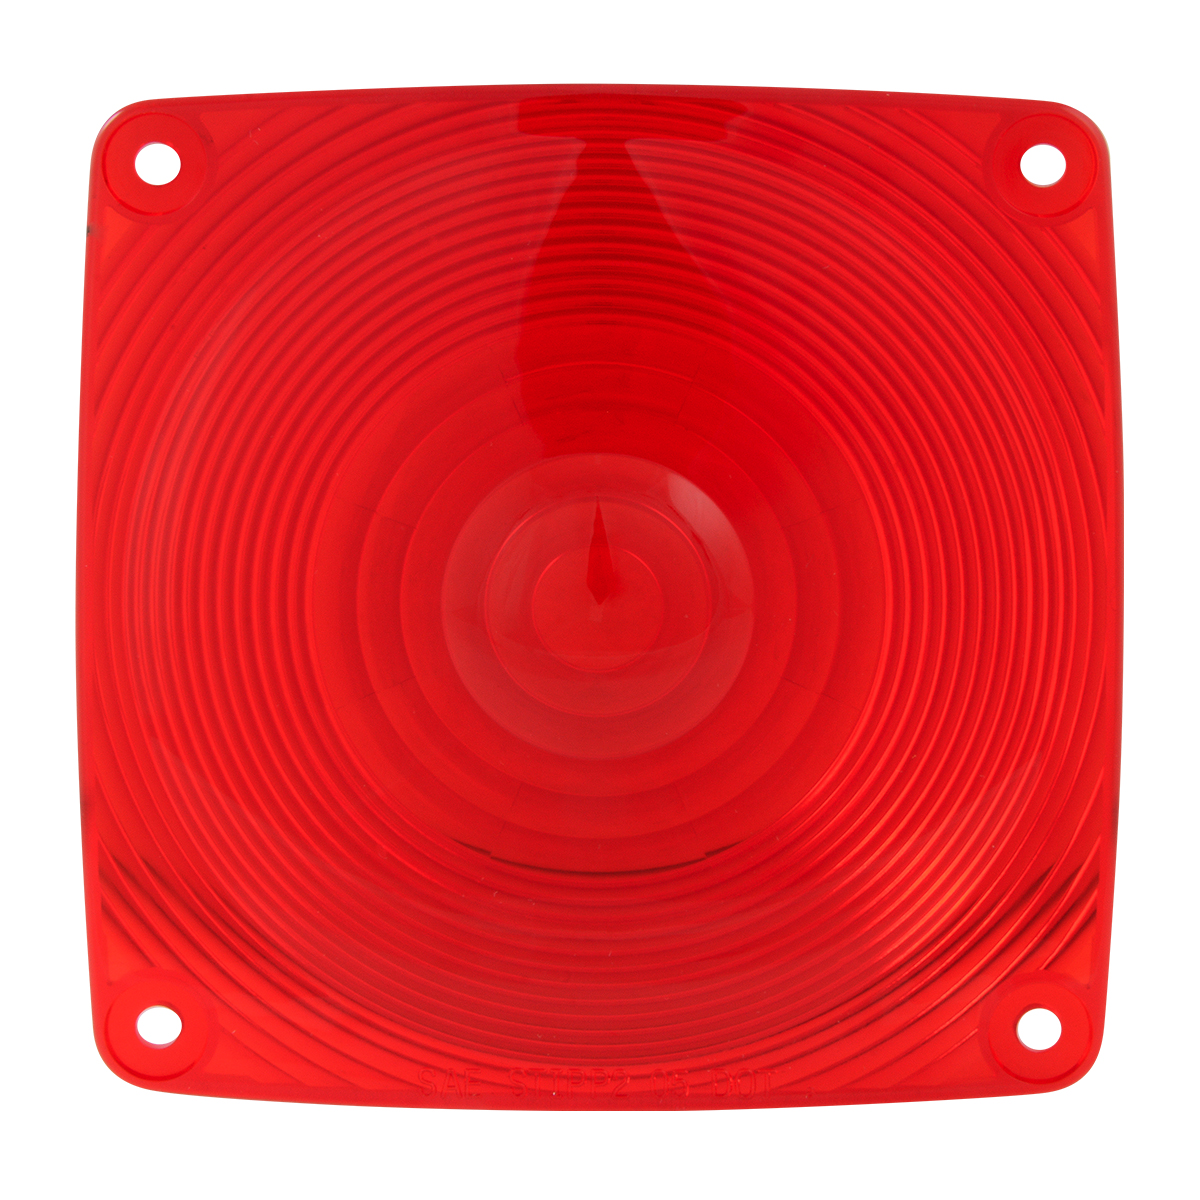 #80352 Square Red Lens